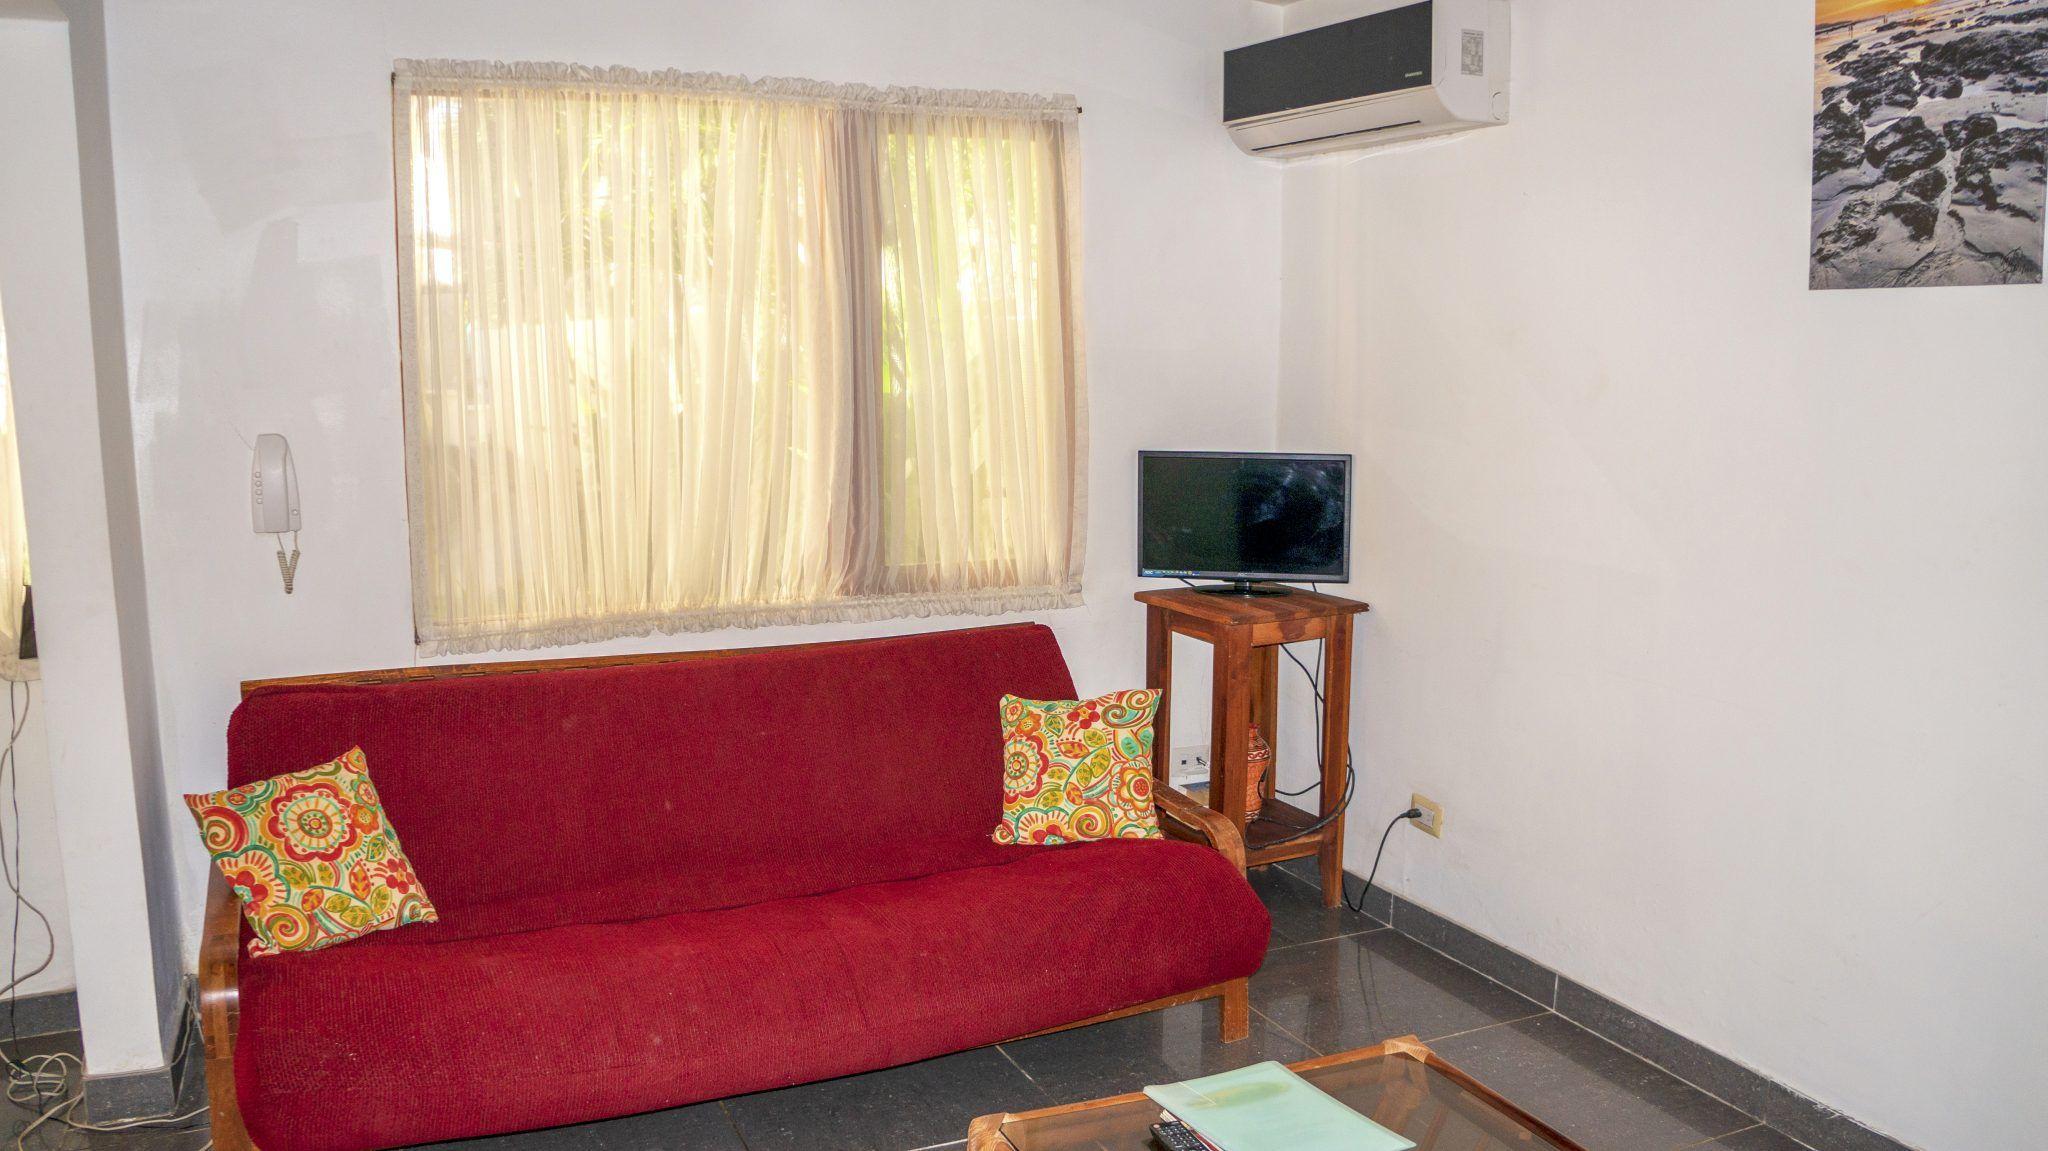 CWC - Living Room + TV